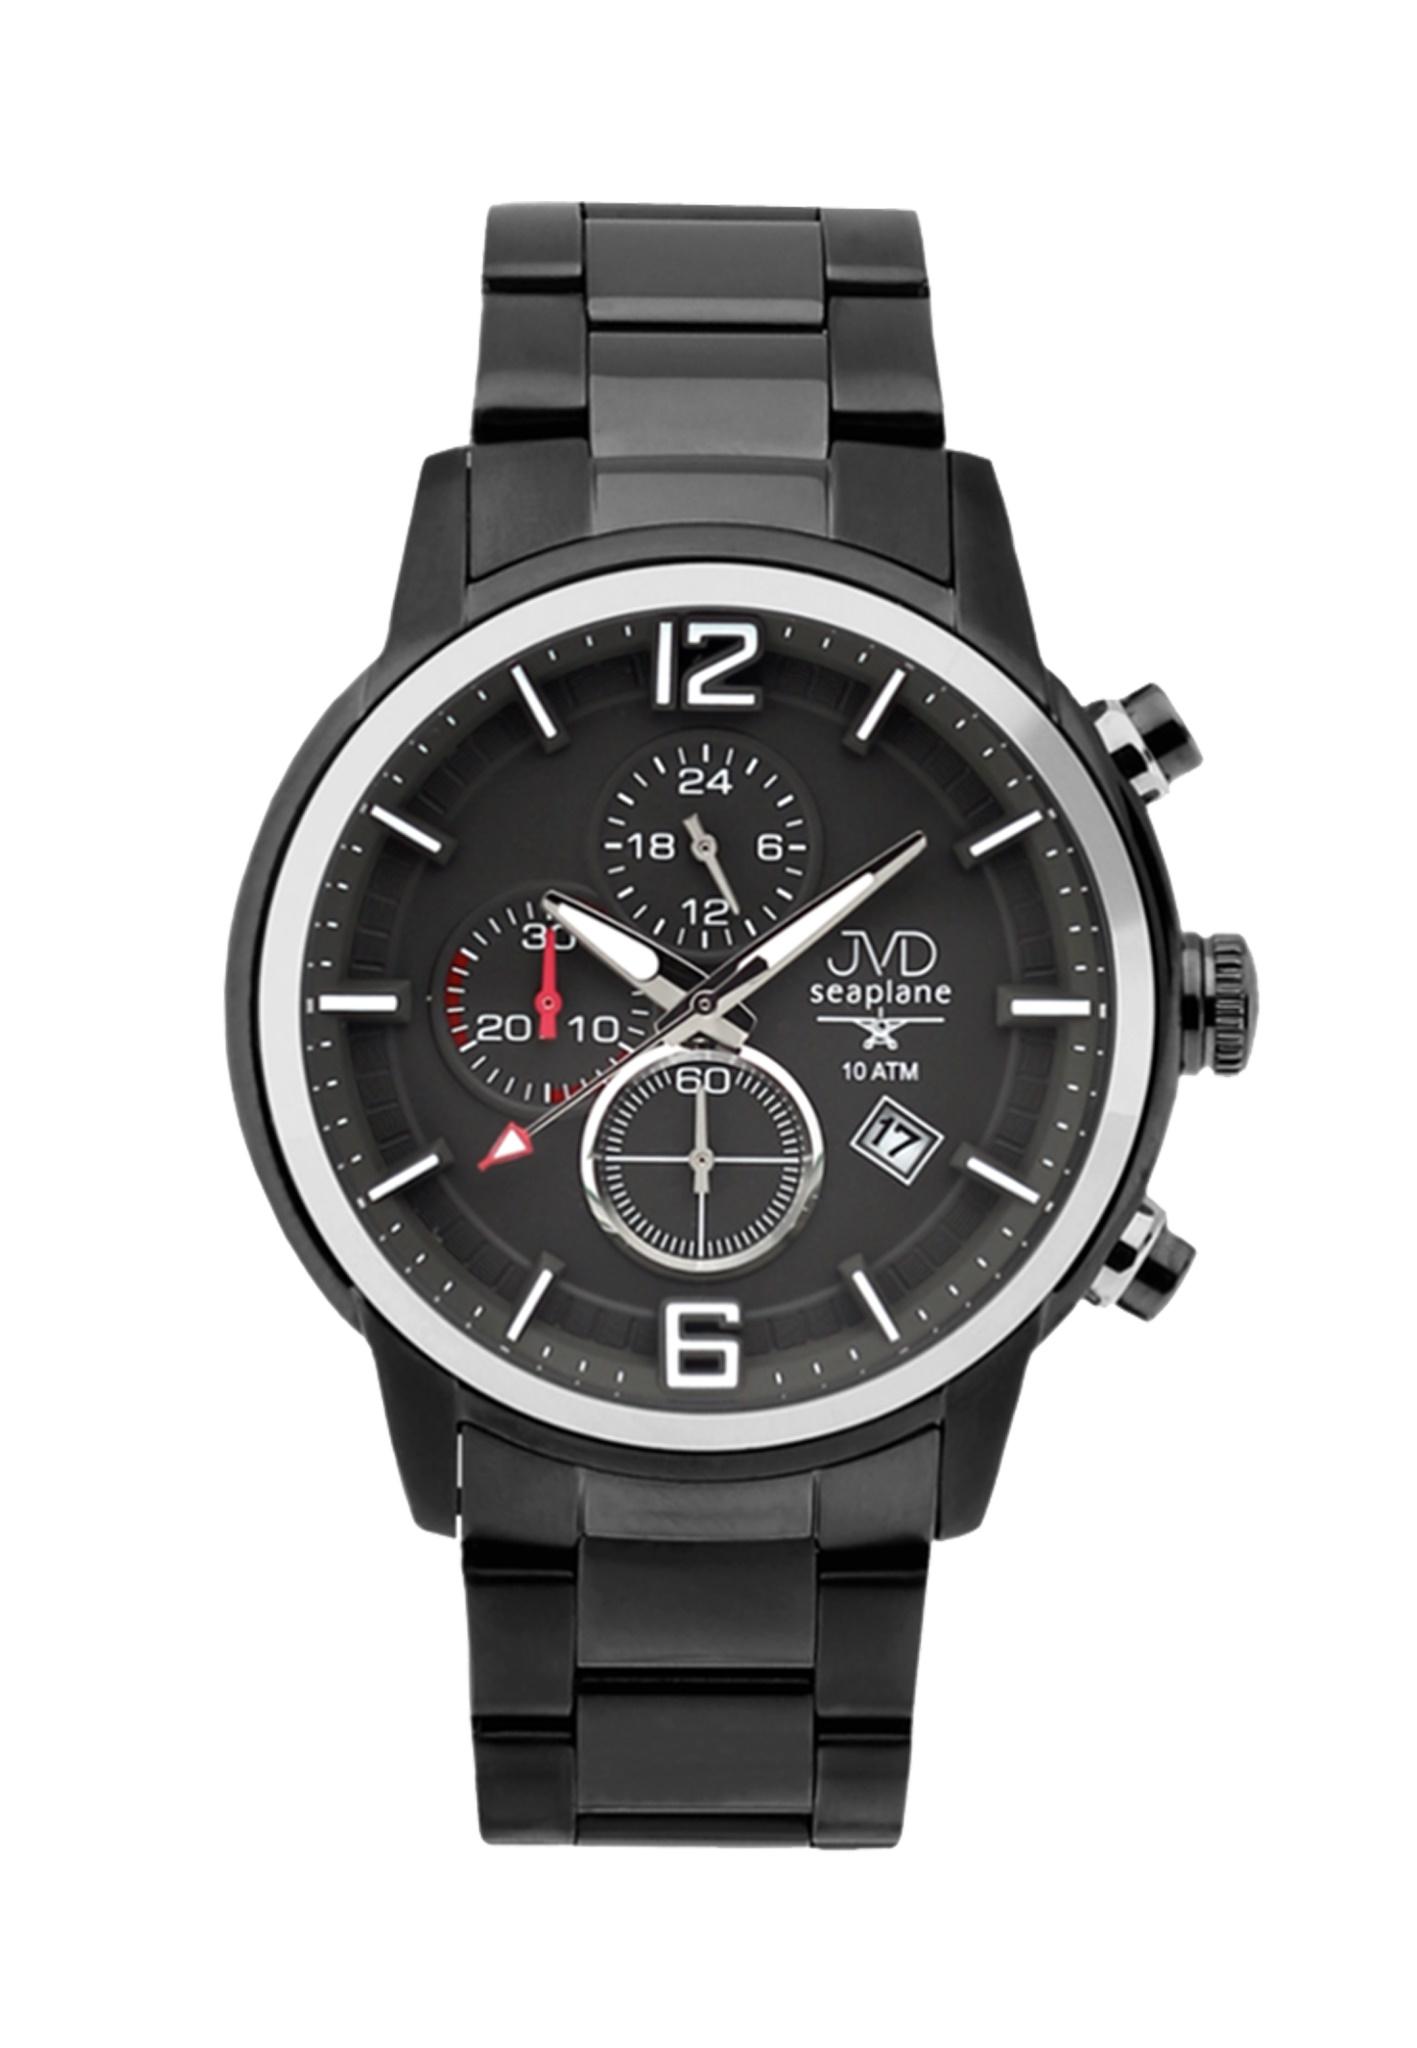 Vysoce odolné černé vodotěsné chronografy hodinky JVD Seaplane METEOR JC667.5 (POŠTOVNÉ ZDARMA!!)